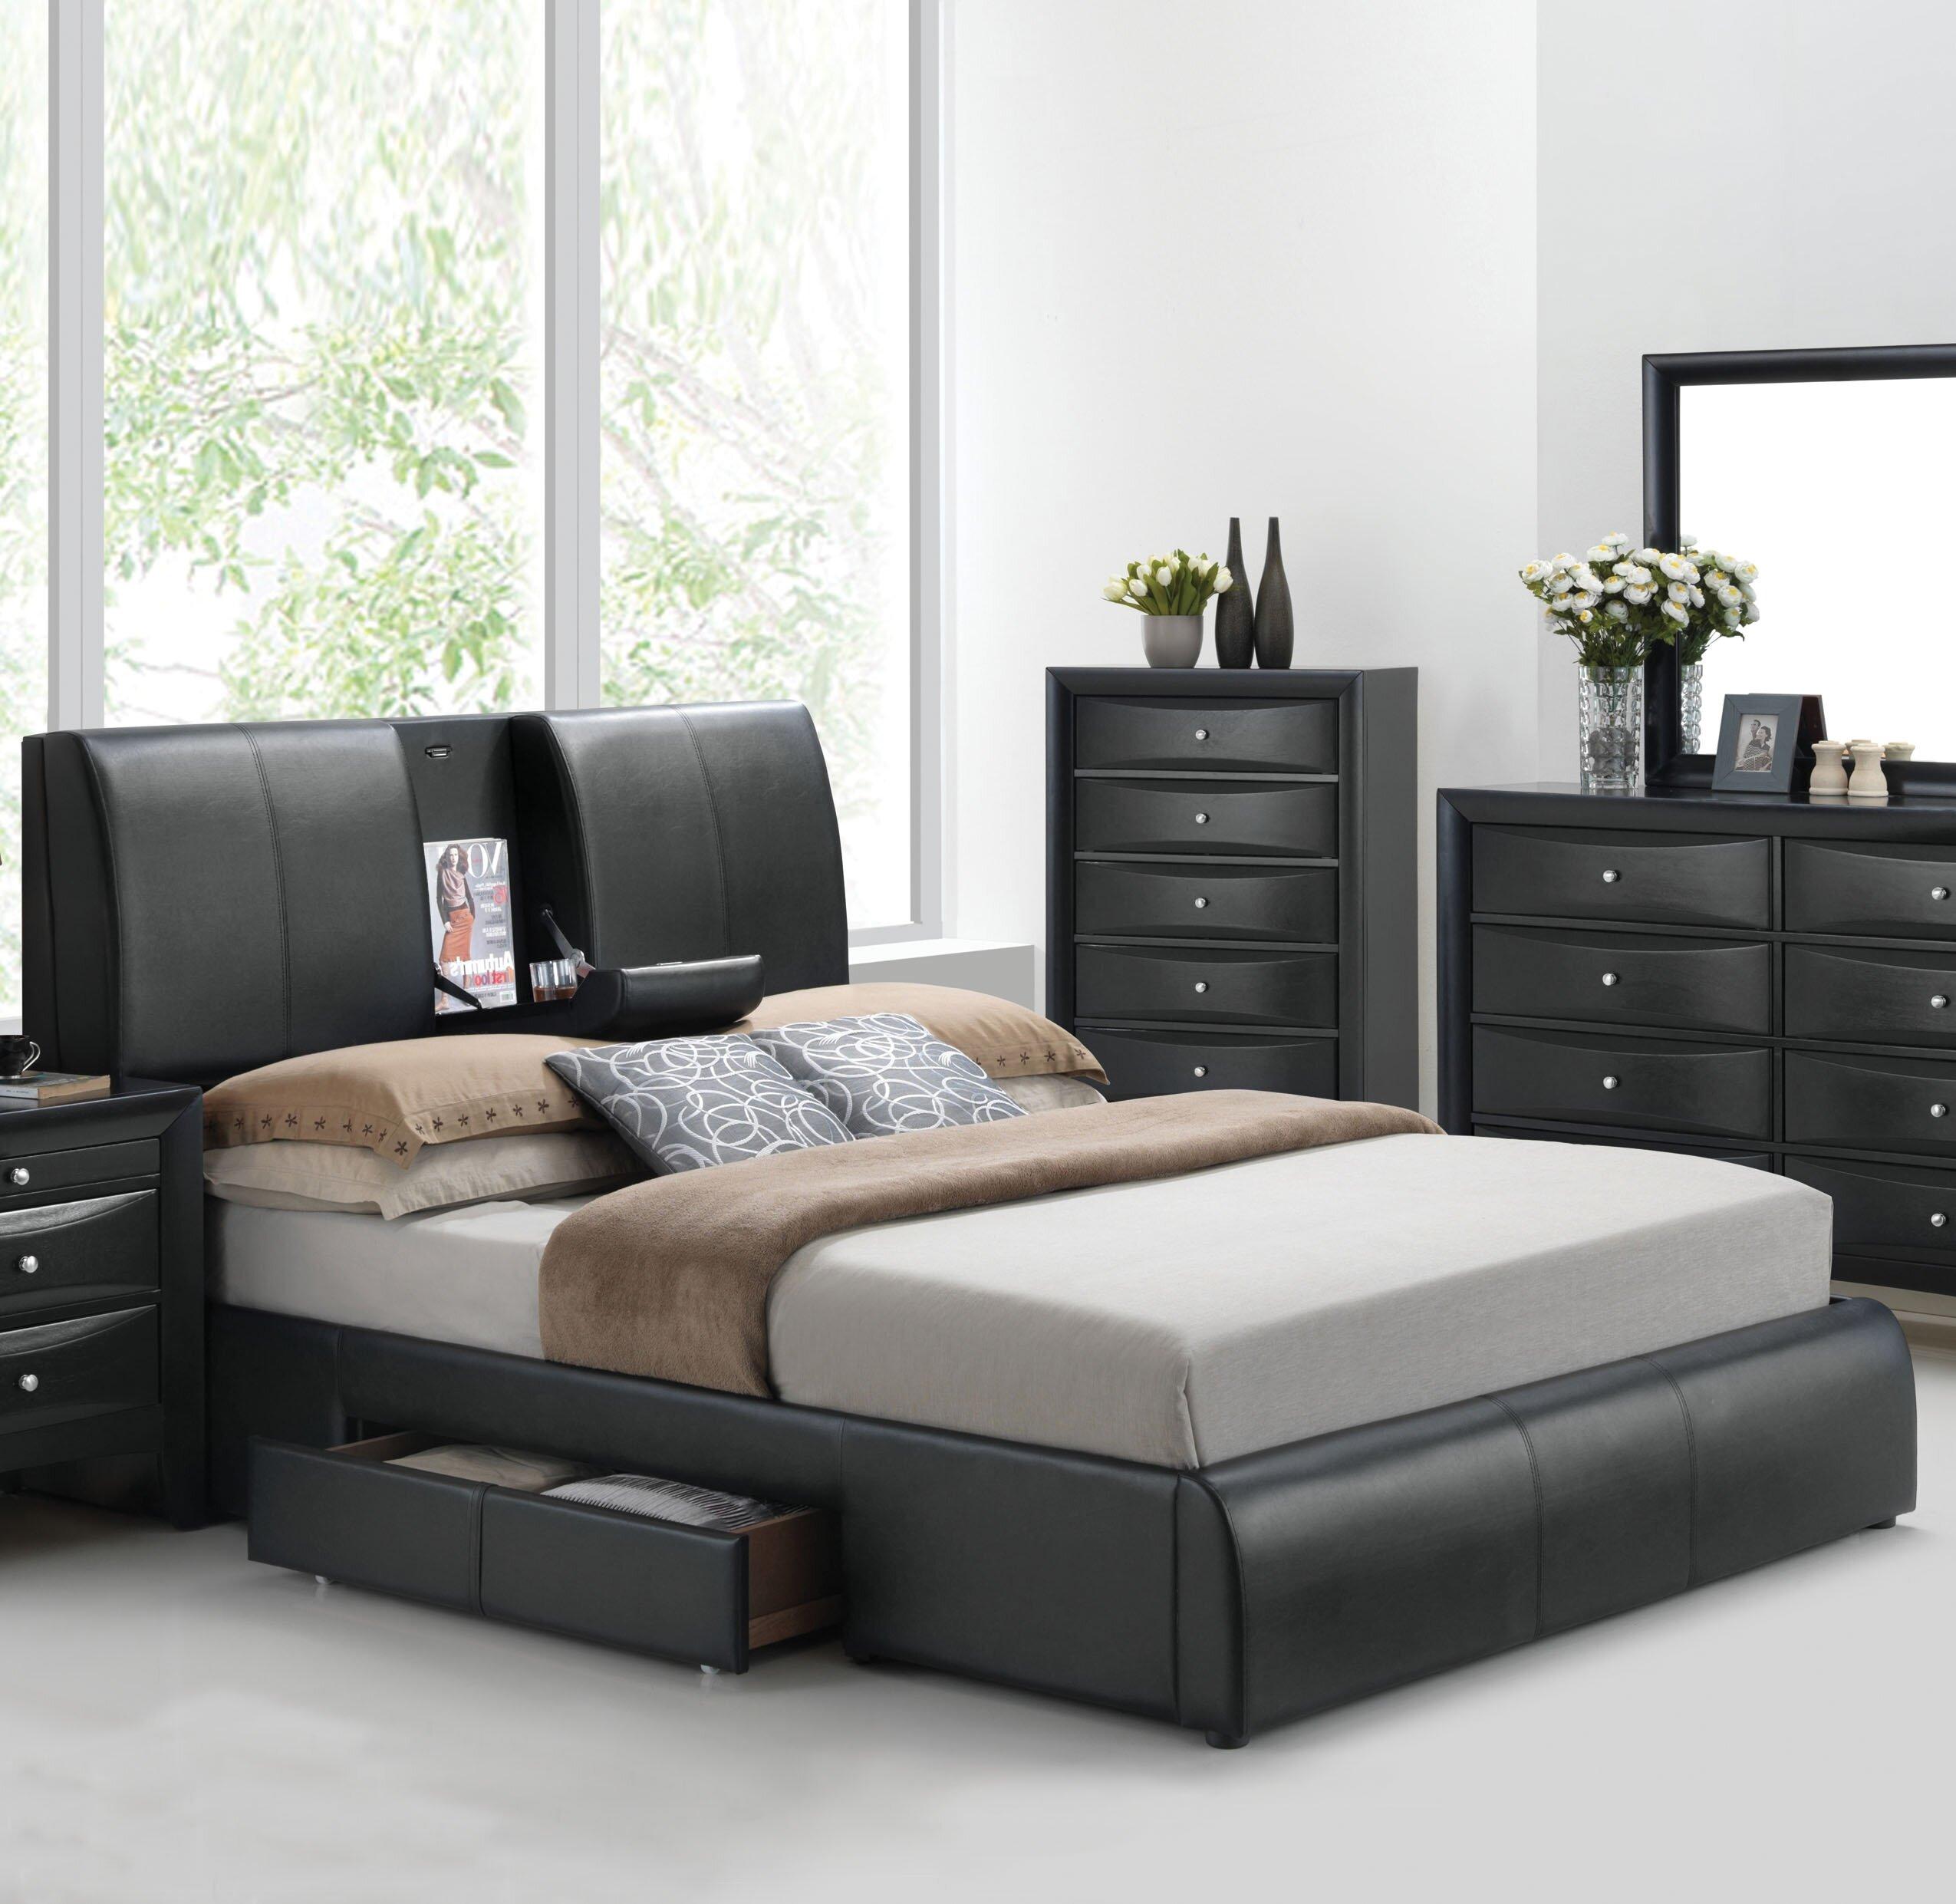 Orren Ellis Horsley Upholstered Storage Platform Bed Reviews Wayfair